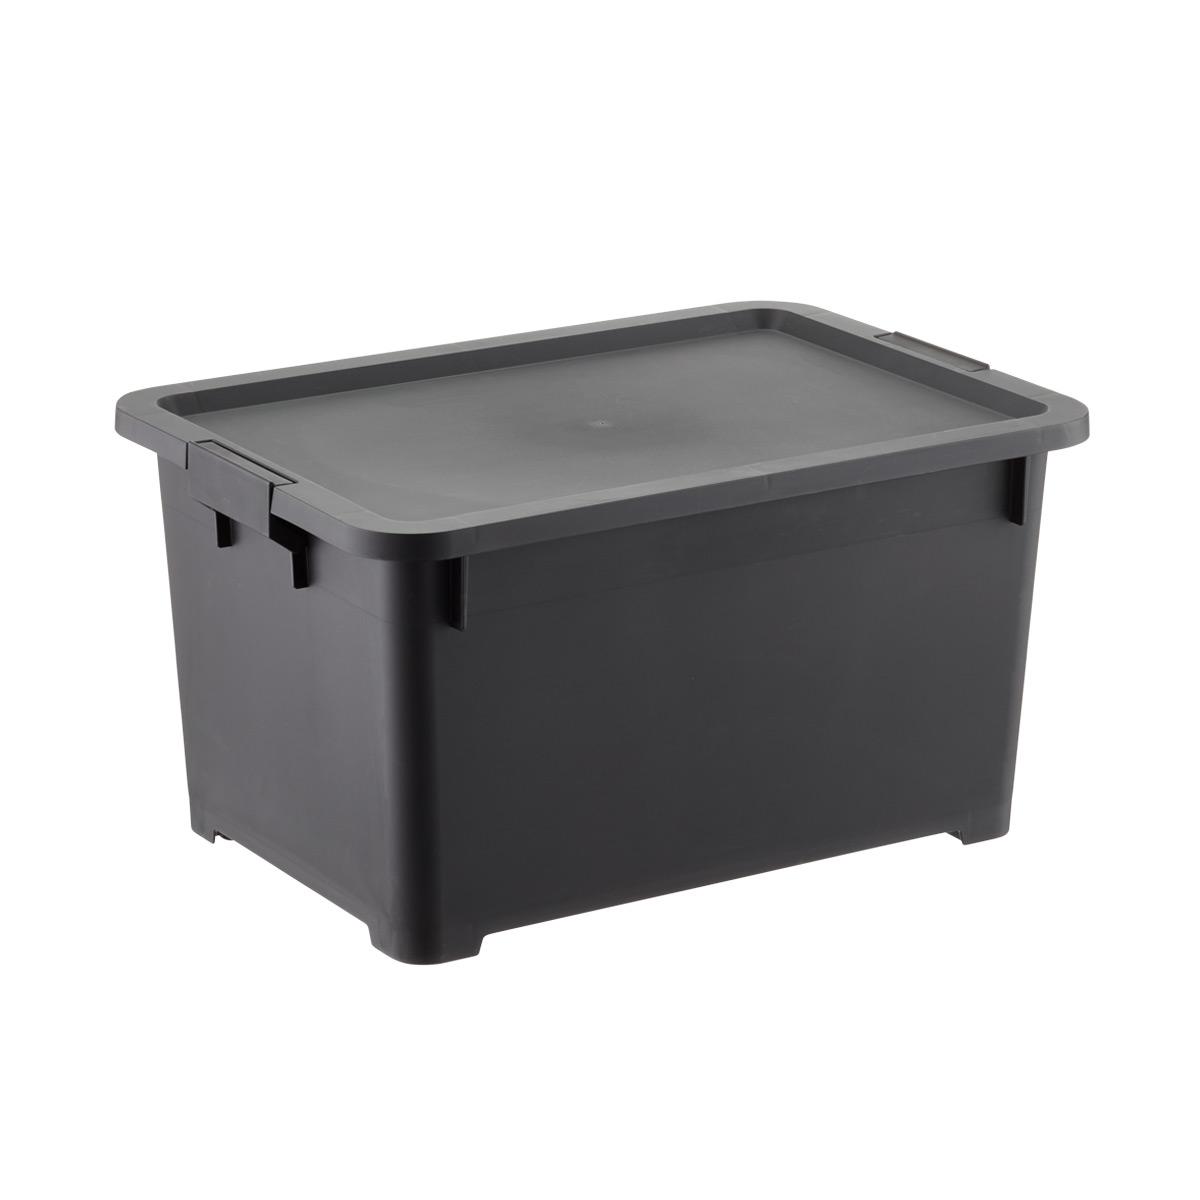 Good Plastic Storage Bins With Lids - 10071421-rolling-plastic-storage-tot  Best Photo Reference_423465.jpg?width\u003d1200\u0026height\u003d1200\u0026align\u003dcenter